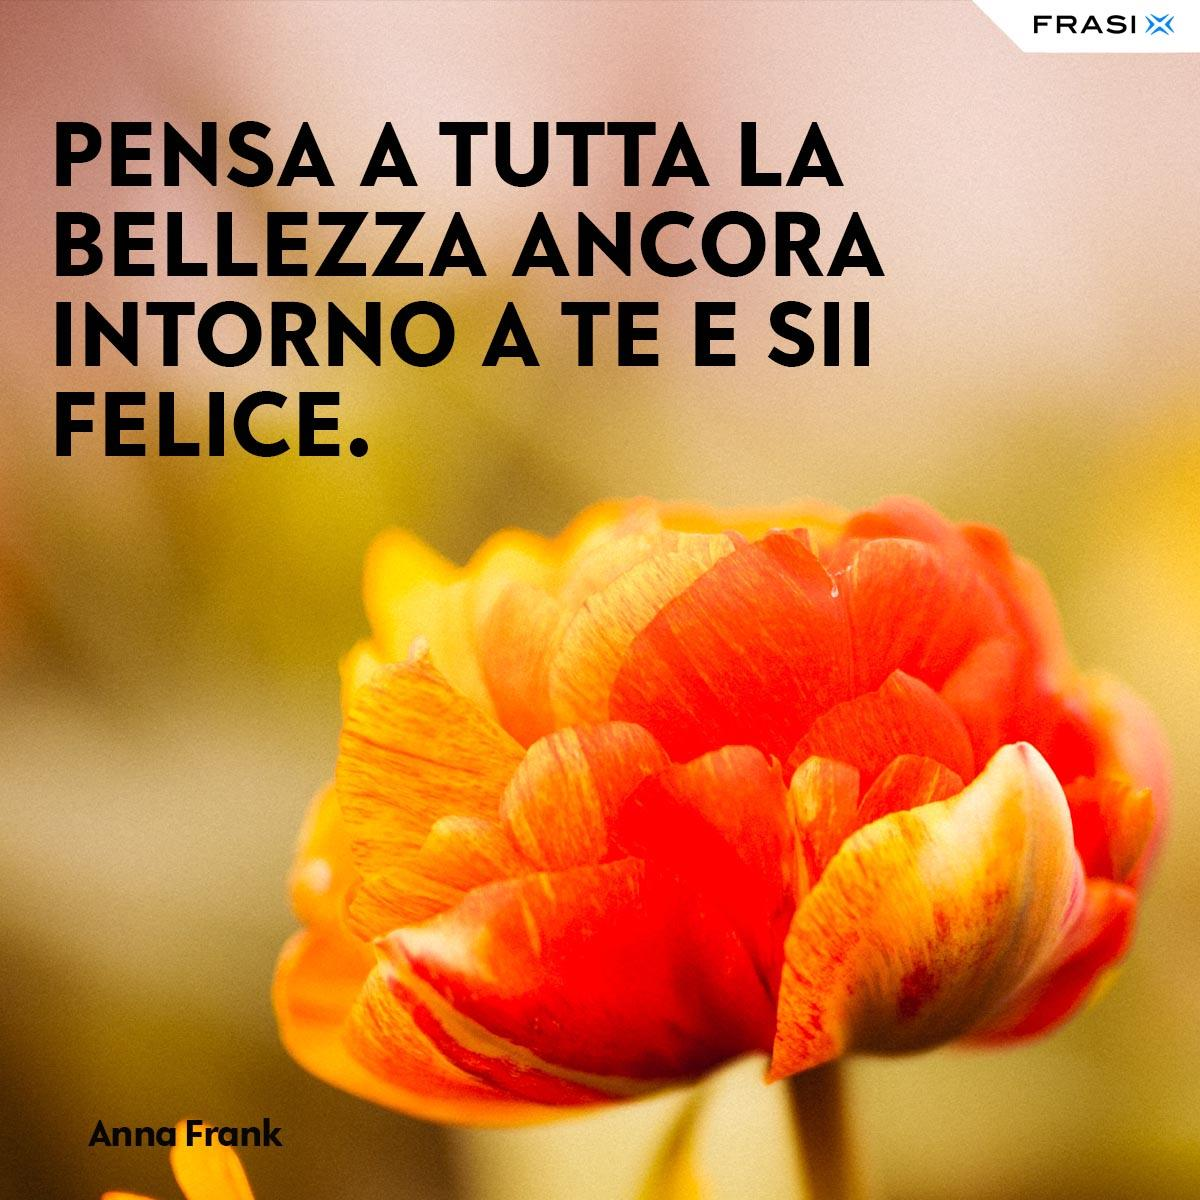 Frasi tumblr Anna Frank